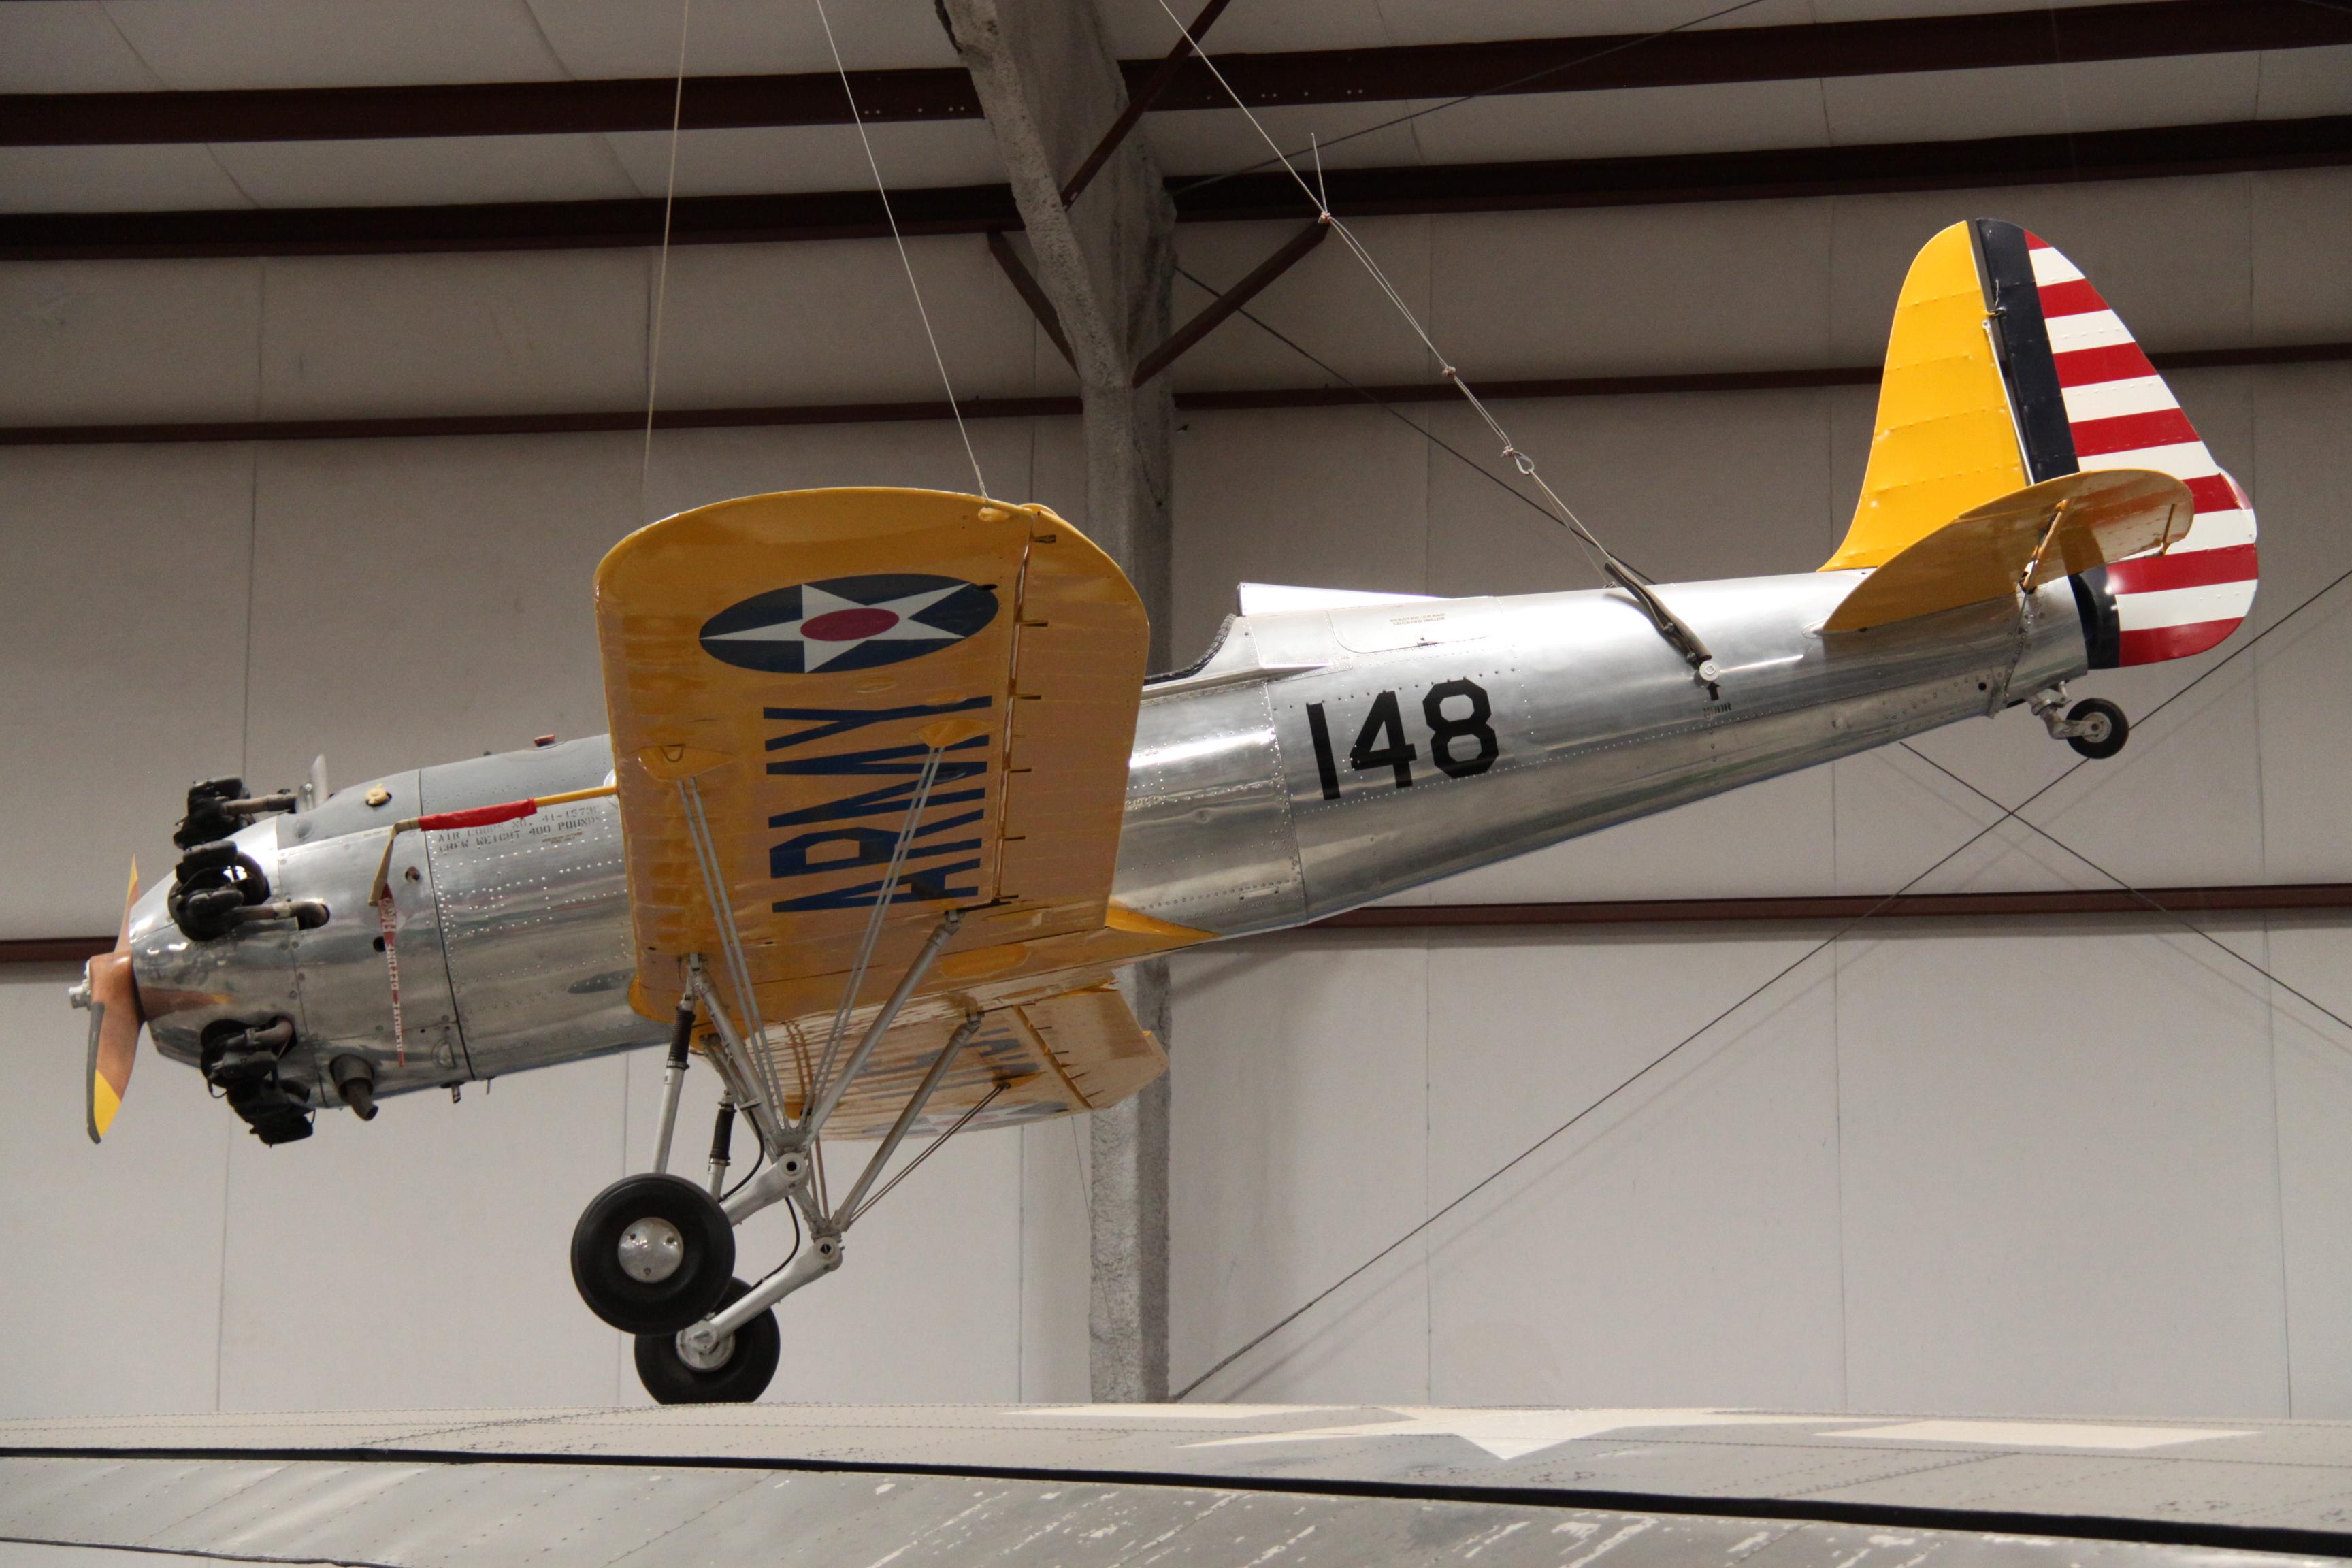 File:148 Ryan PT-22 Recruit U.S. Army ( 41-15736 ...